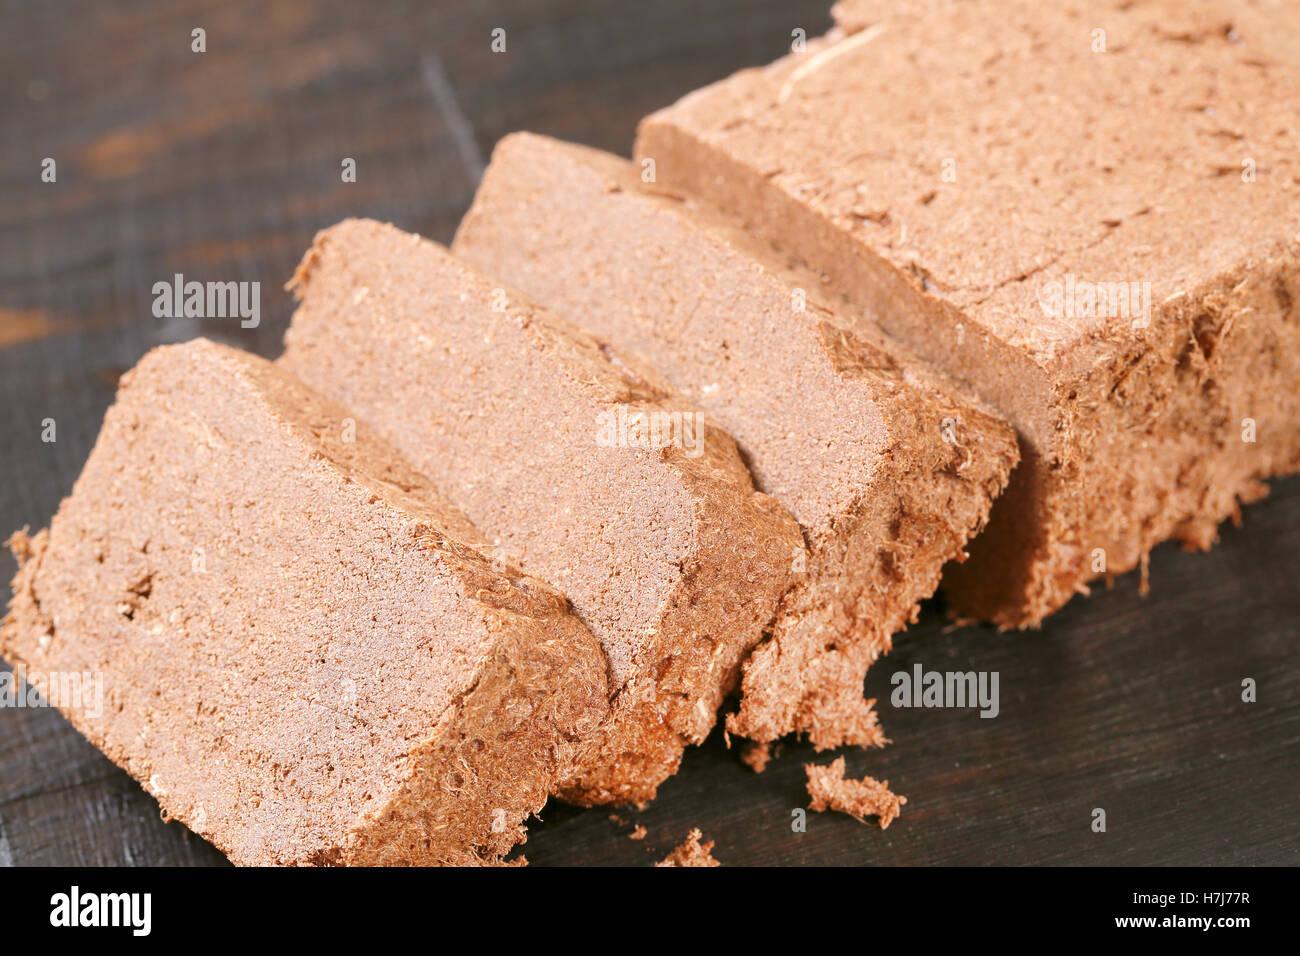 Slices of chocolate halva on cutting board - Stock Image